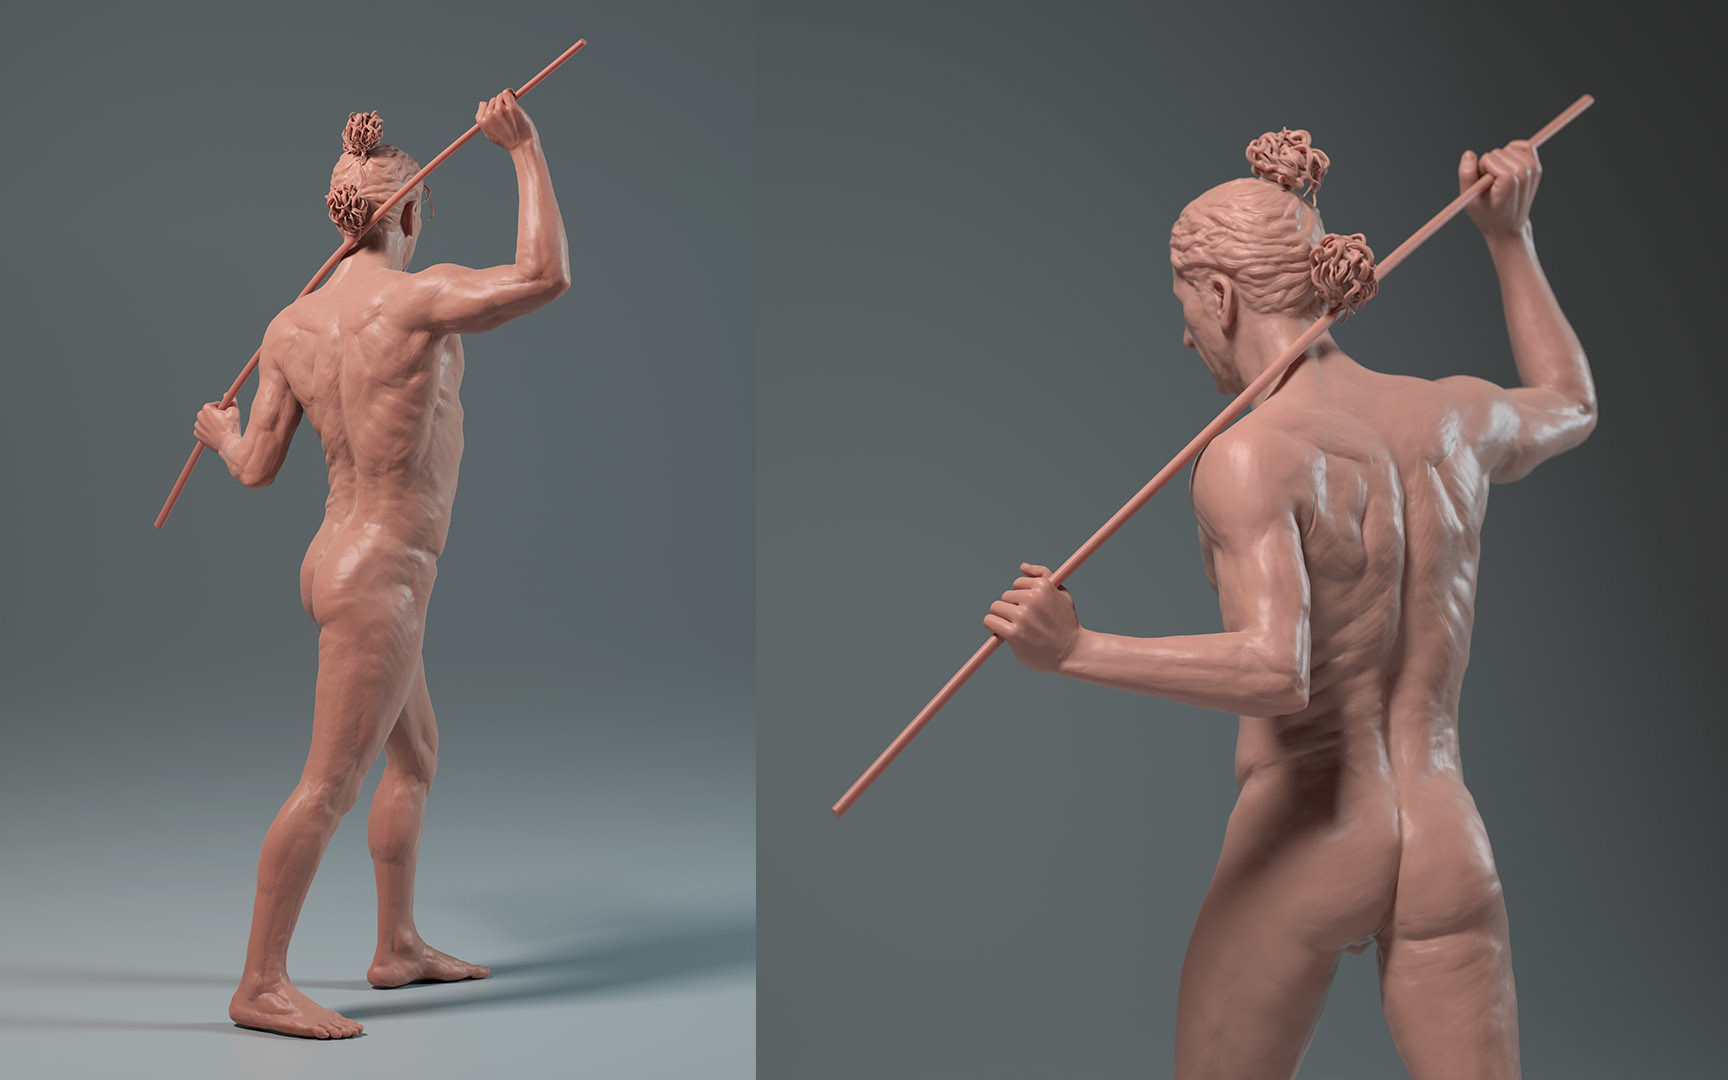 Carl christian gehl anatomystudy fullfigure back